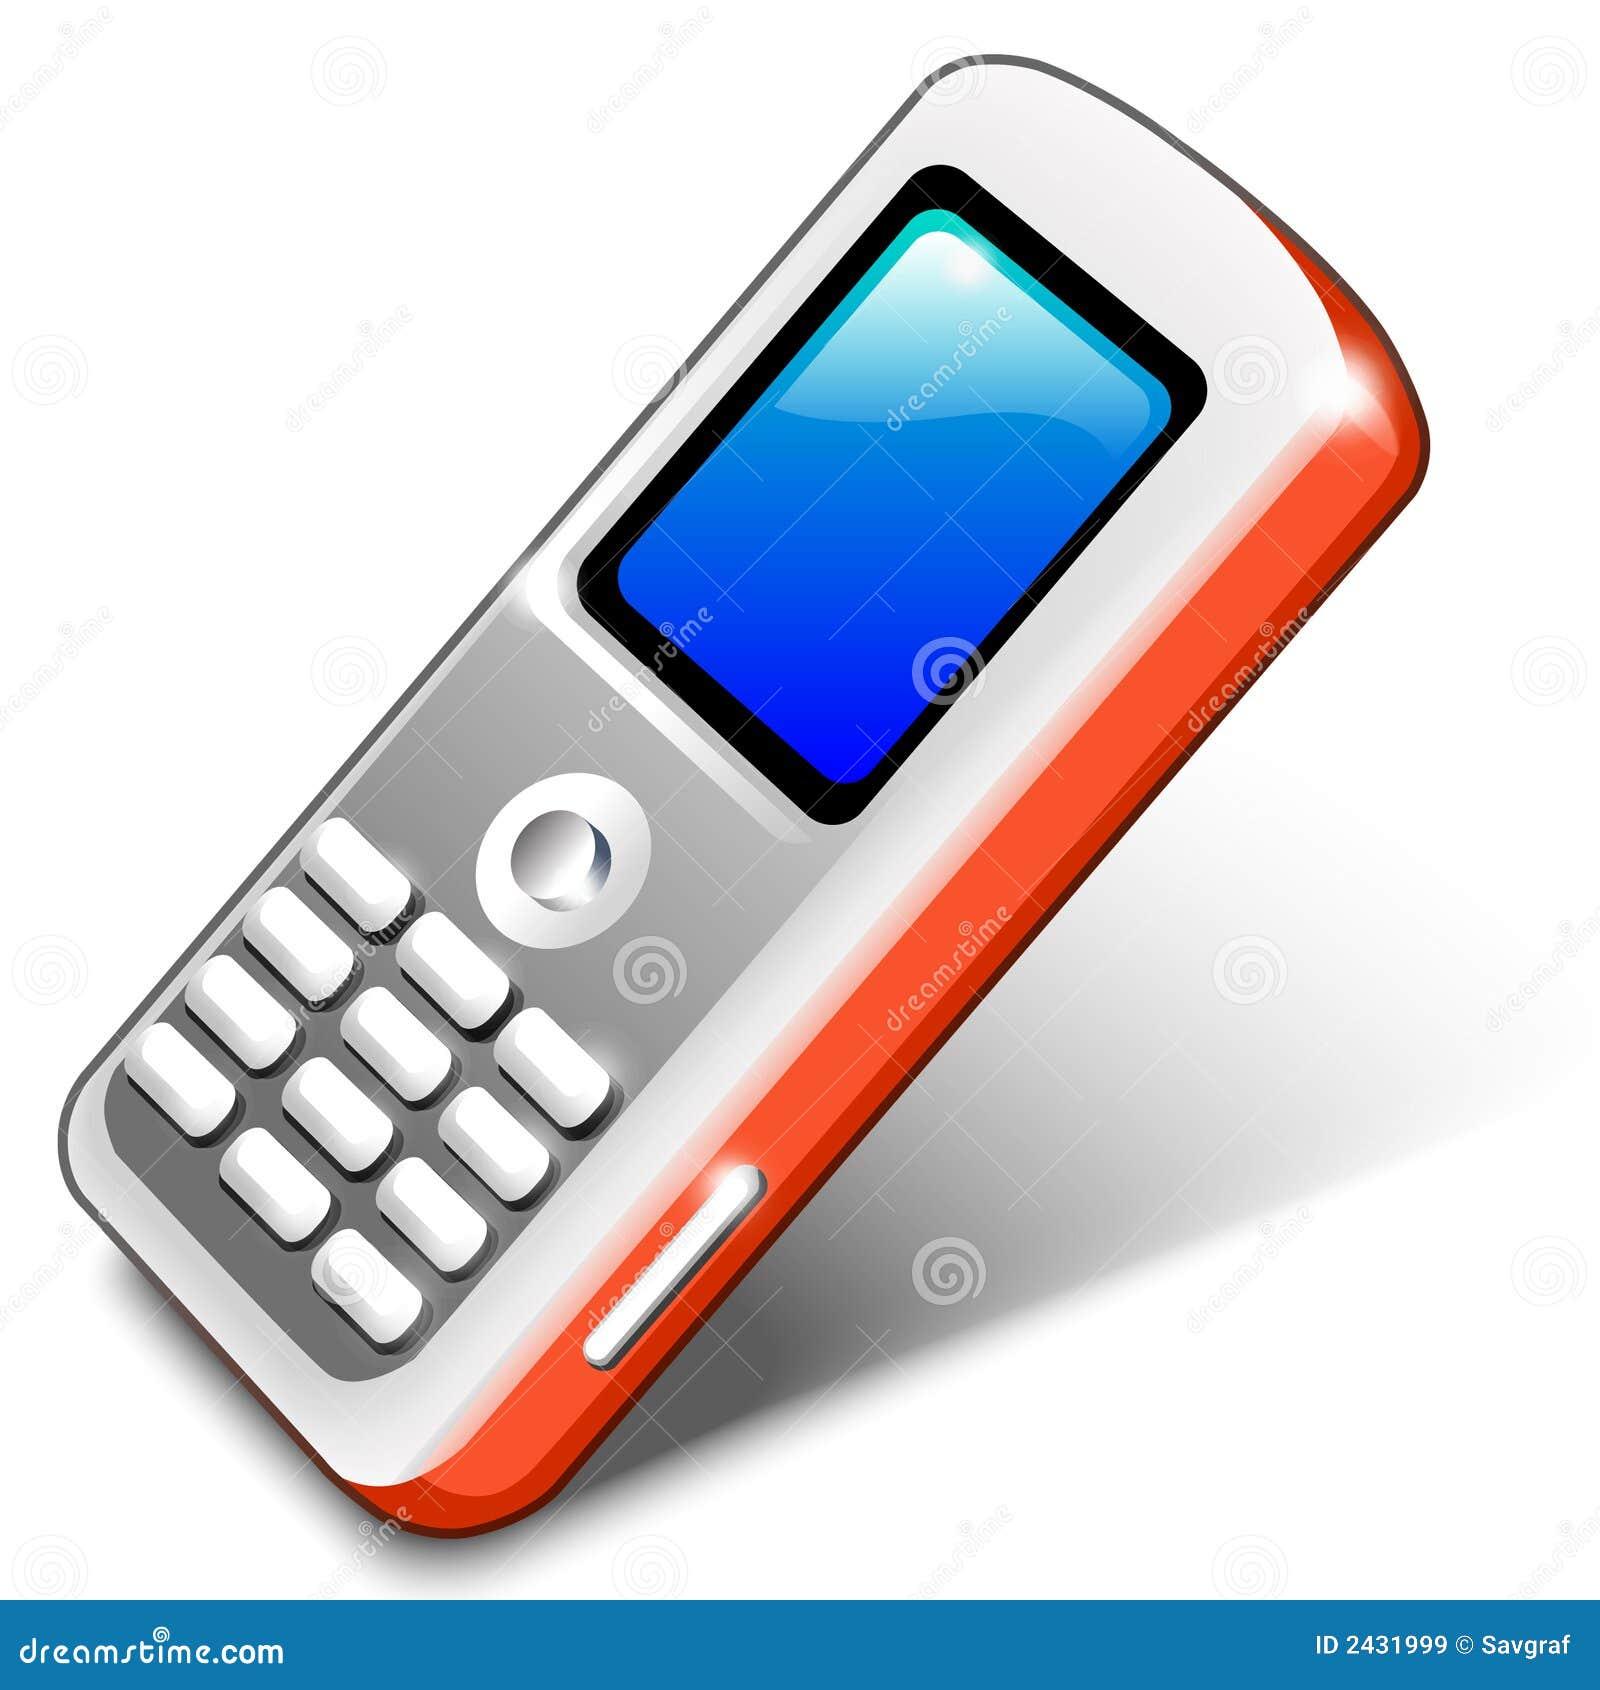 red mobile telephone royalty free stock images image. Black Bedroom Furniture Sets. Home Design Ideas